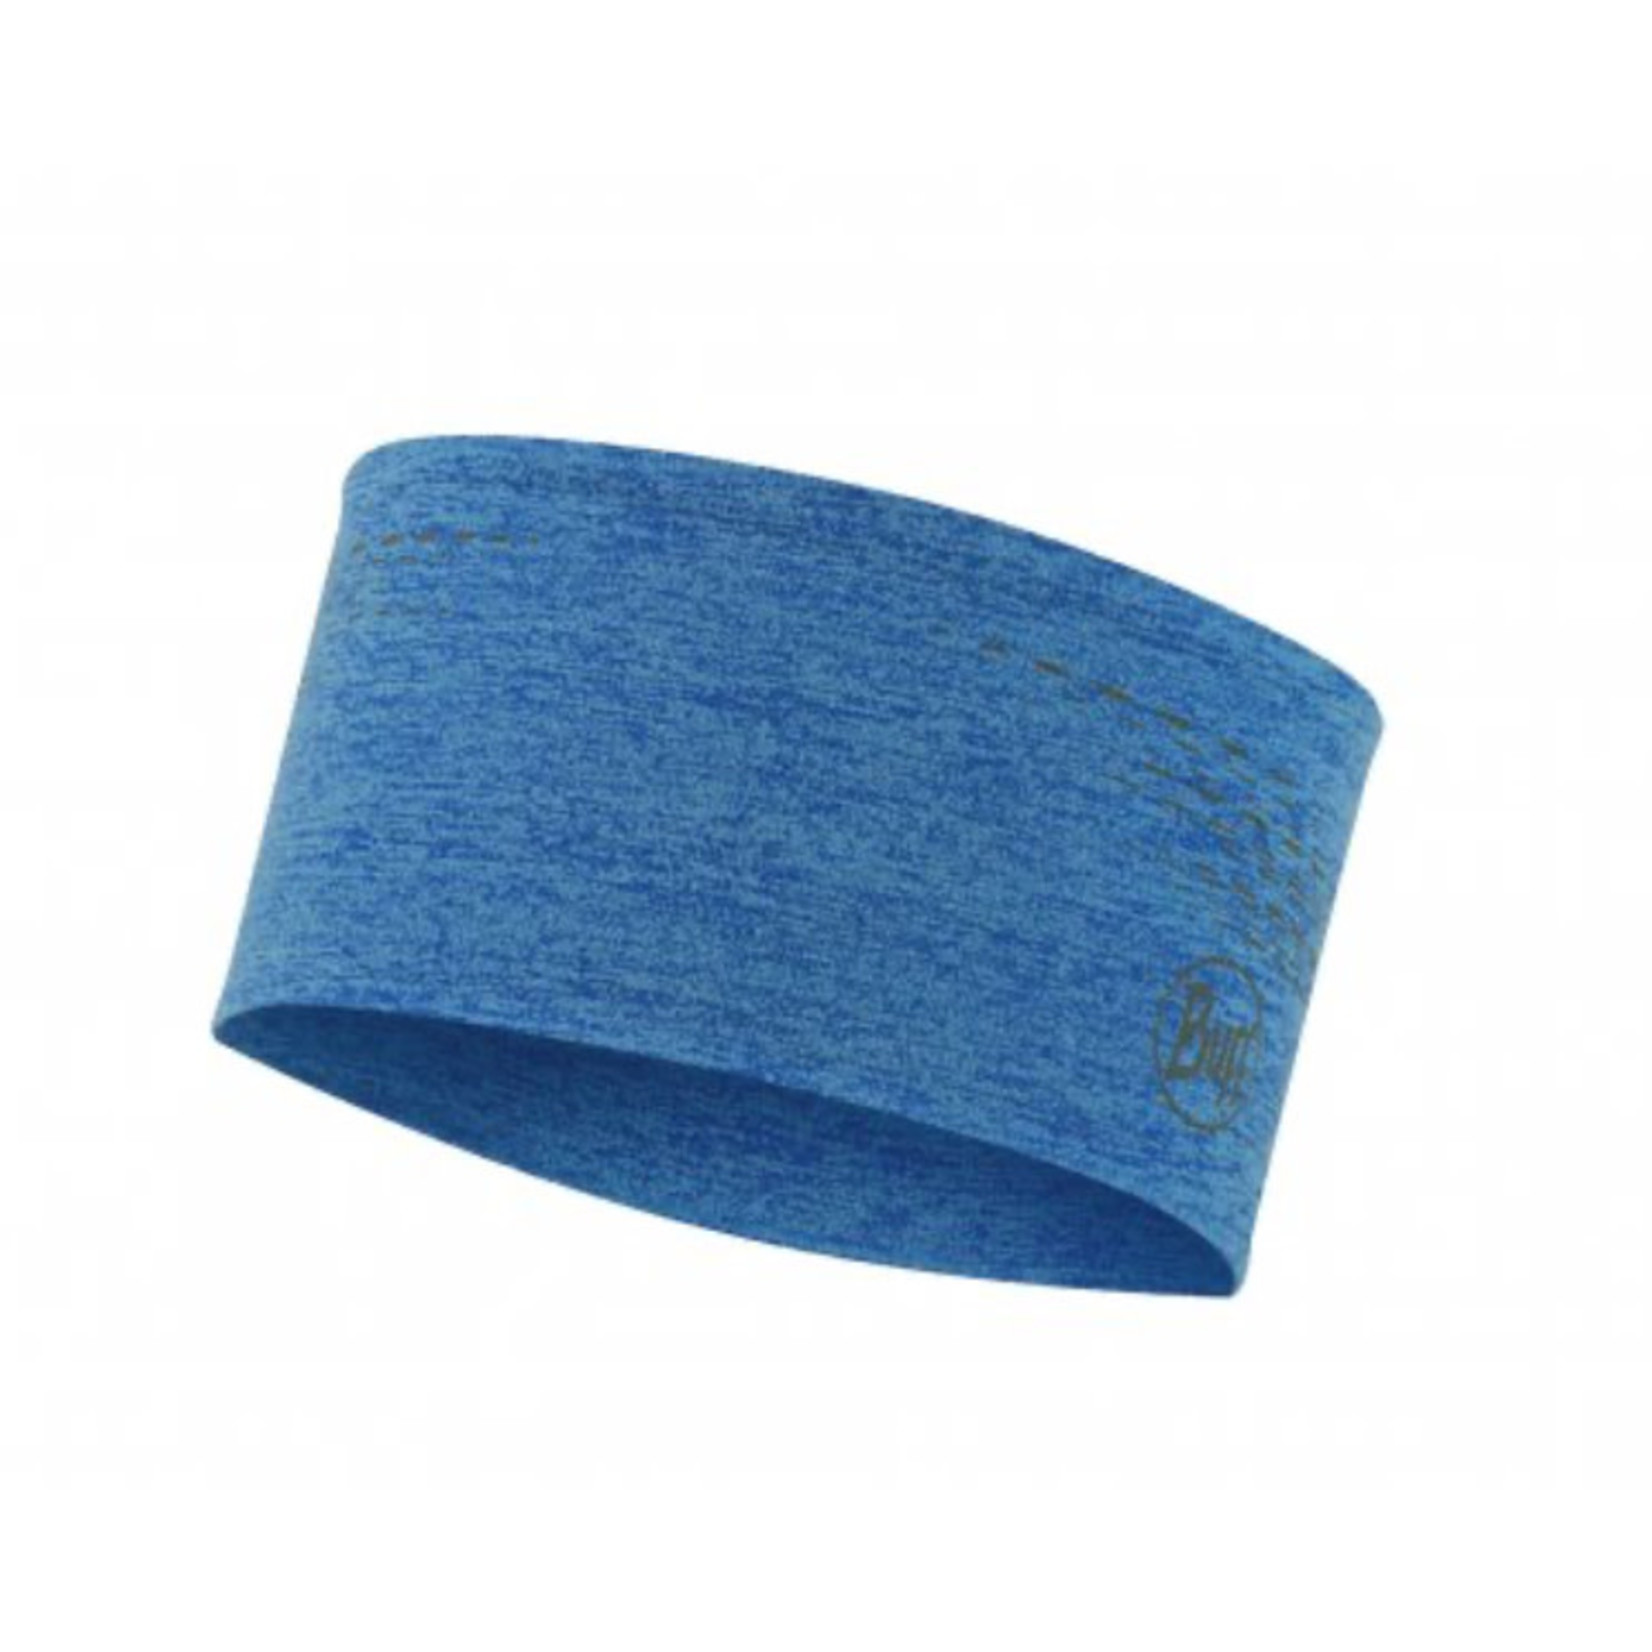 Buff Buff Dryflx Headband Reflective Olympian Blue 118098.760